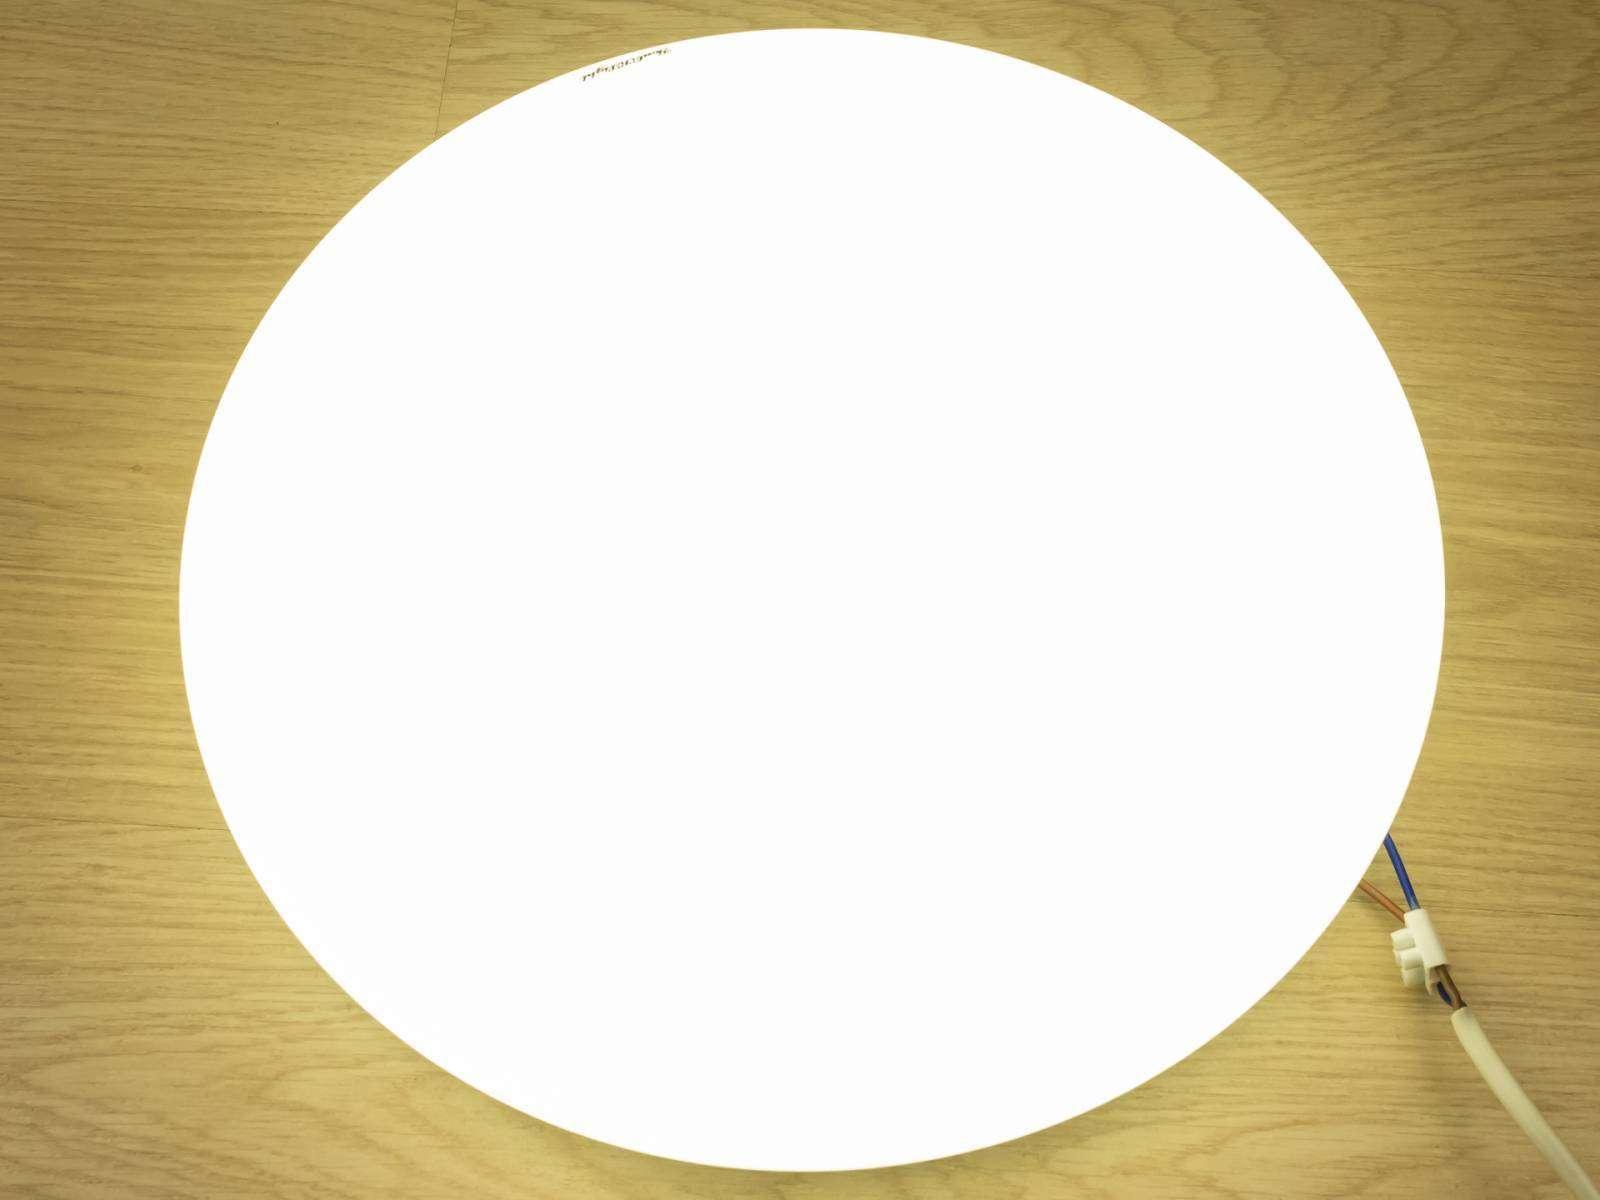 GearBest: Обзор LED светильника YouOKLight с пультом ДУ